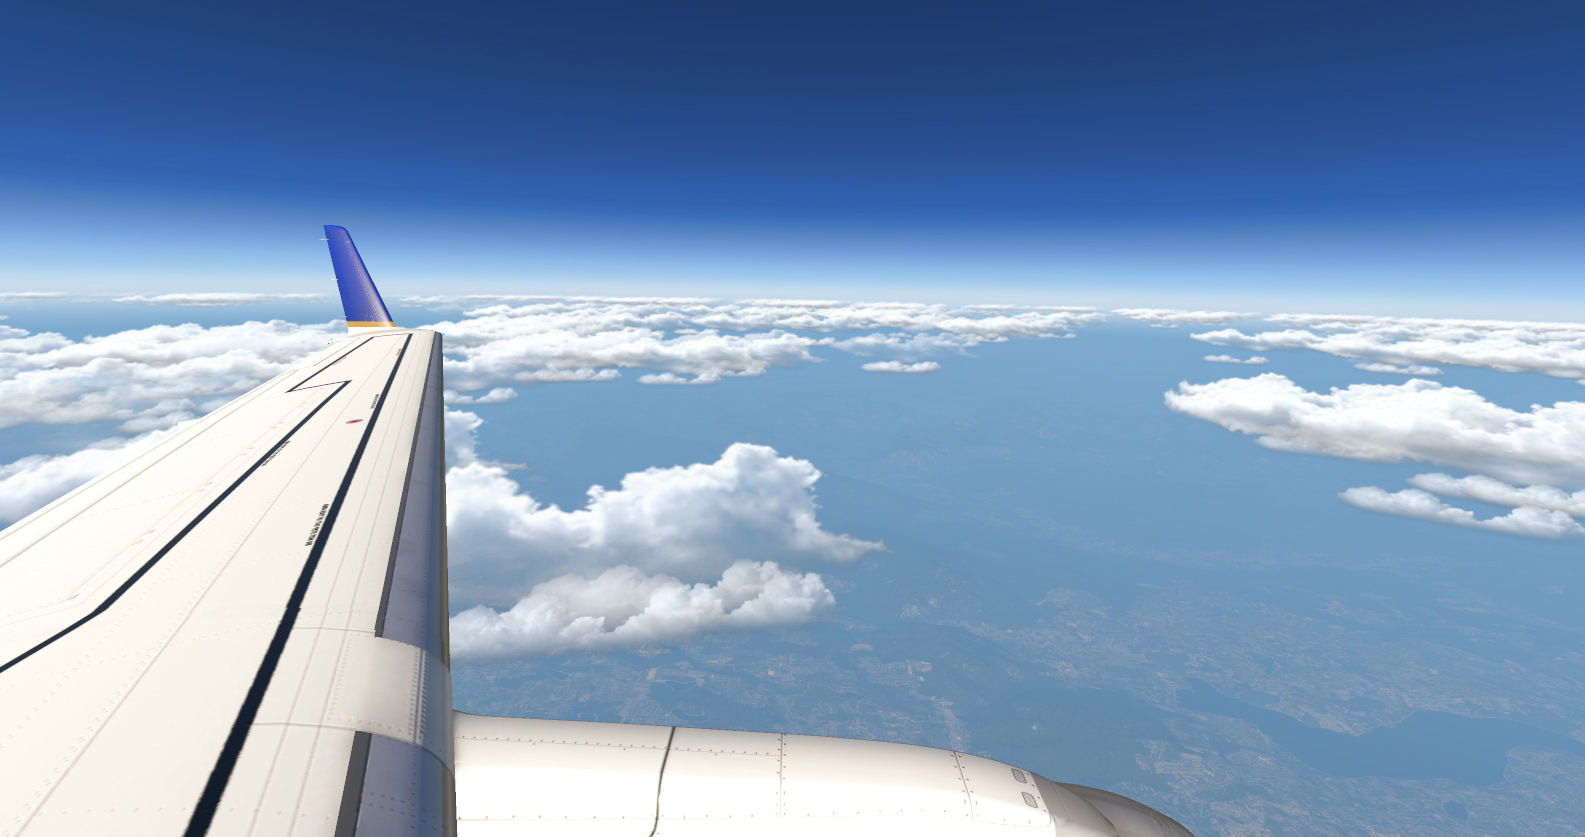 Обсуждение X-Plane 11 - Page 163 - X-Plane 11 - AVSIM su Forums